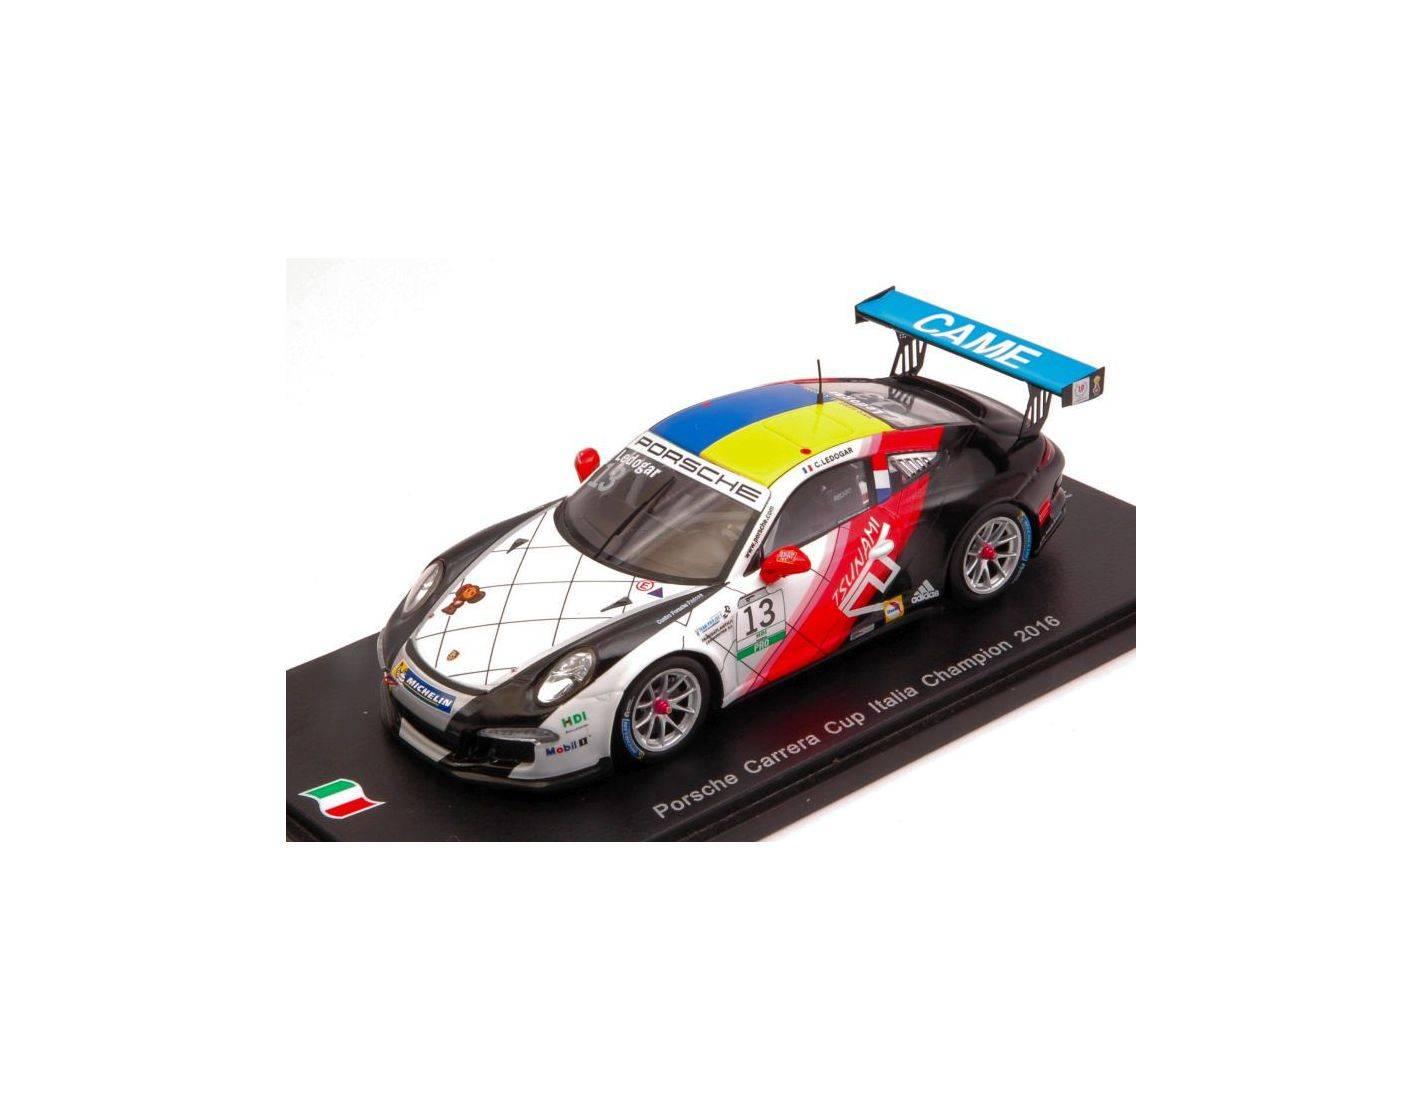 Model Gt3 R Champion 13 2016 N Si005 Pcc Spark C Italia Porsche 991 4j5q3ARL